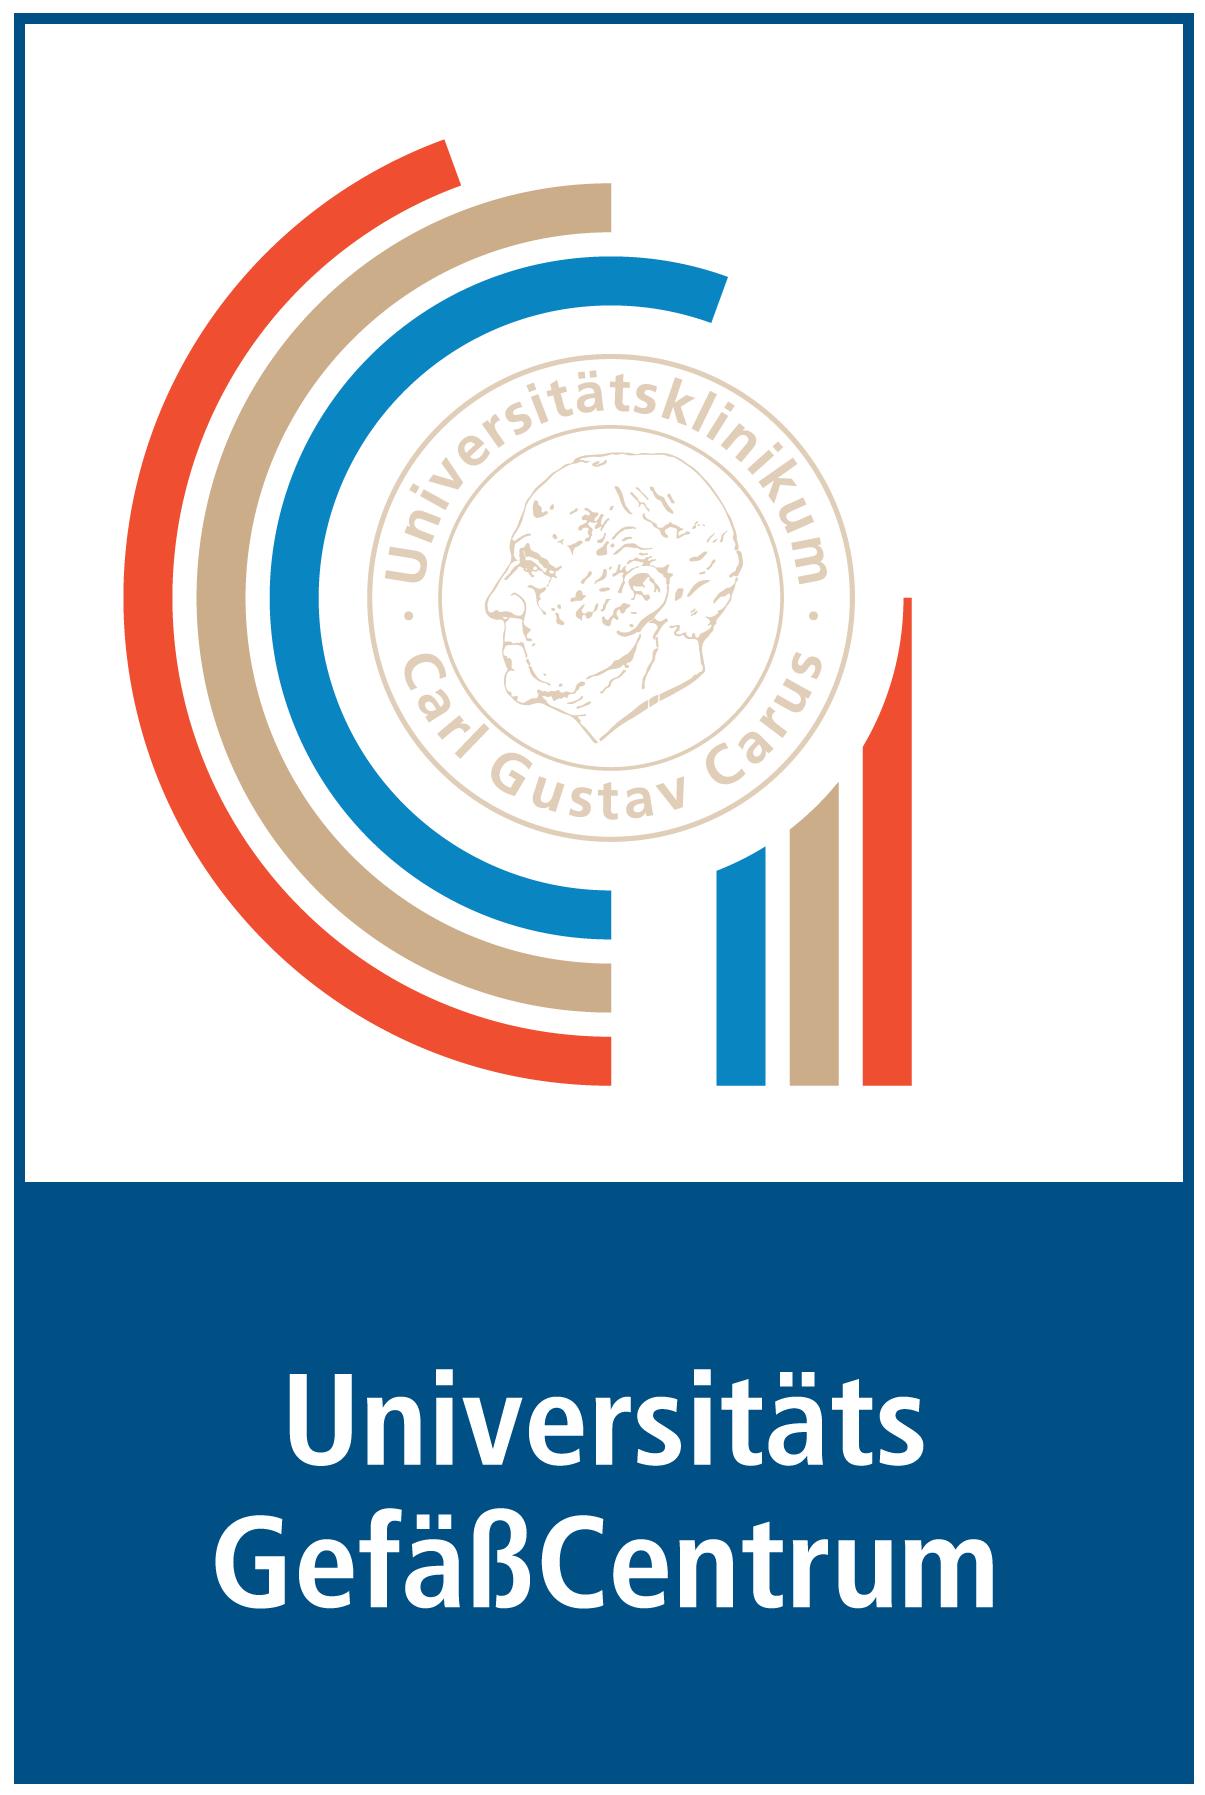 Logo_UGC_hires.png